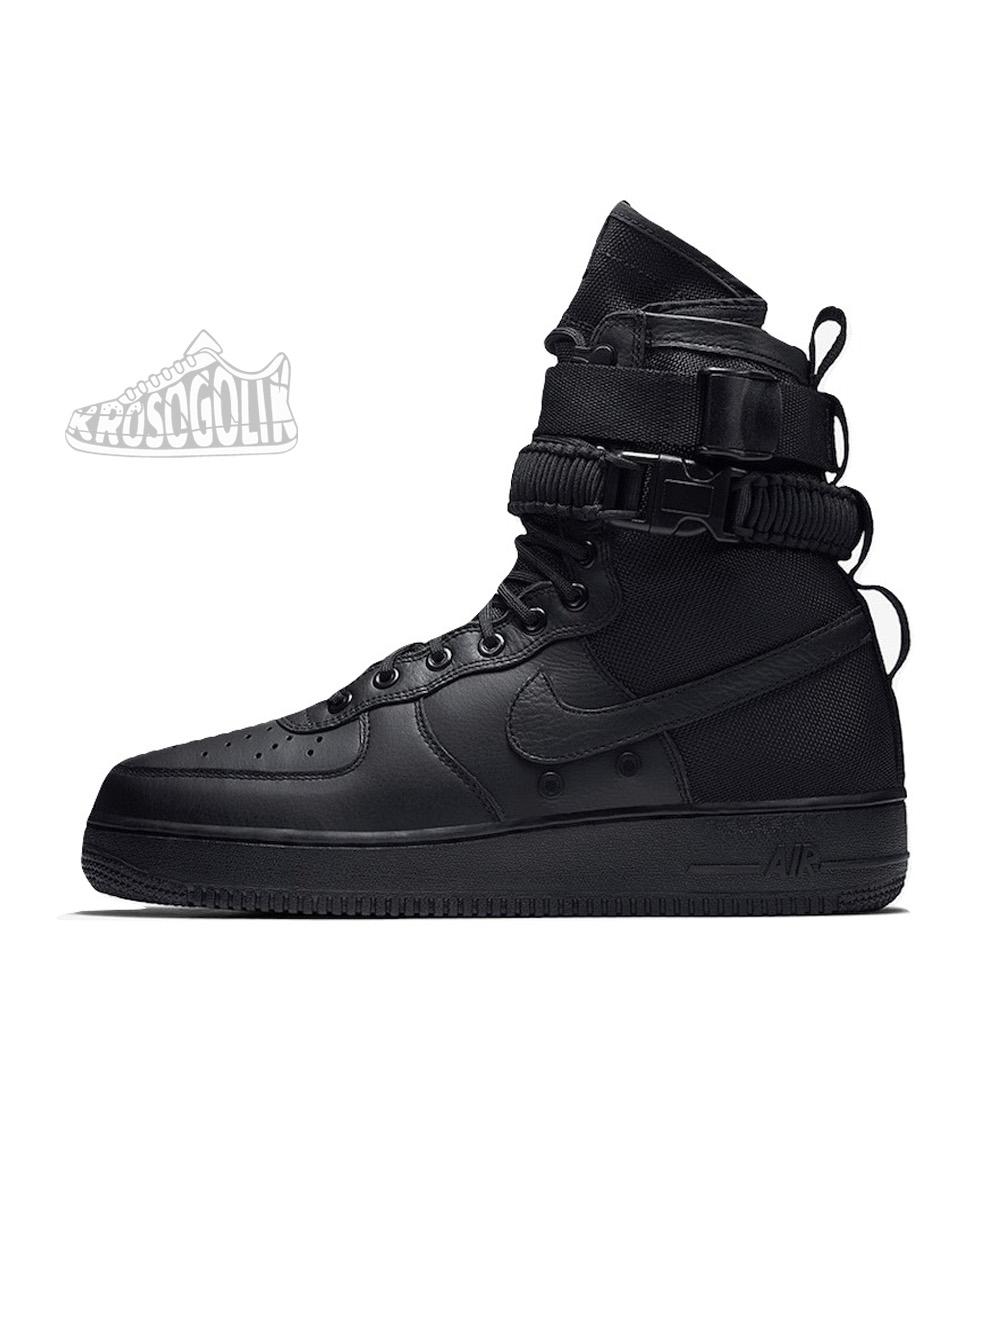 70074b7f Купить мужские кроссовки Nike Air Force 1 Special Field Black на ...